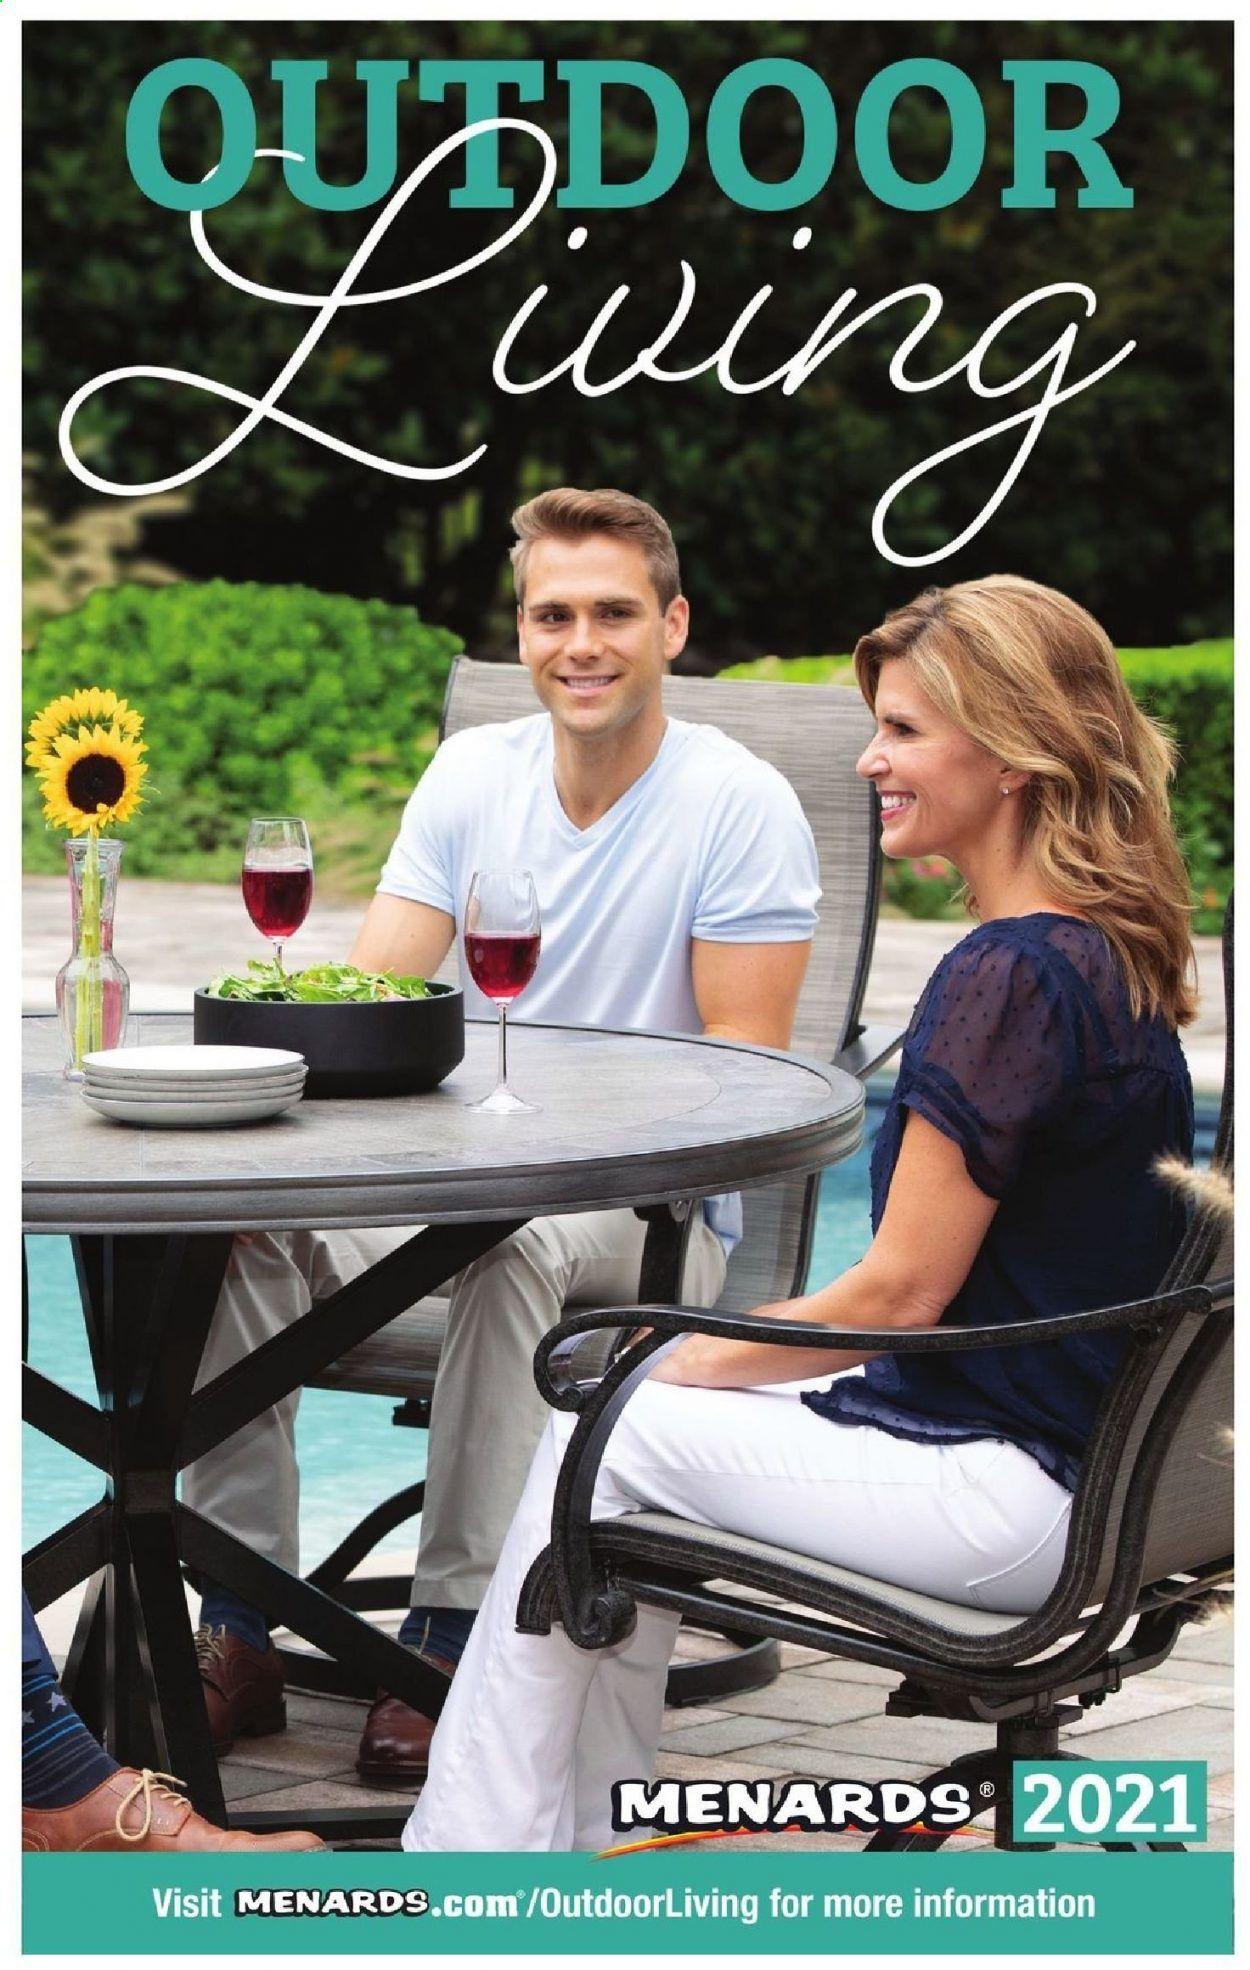 Menards Outdoor Living Catalog 2021 - Page 1